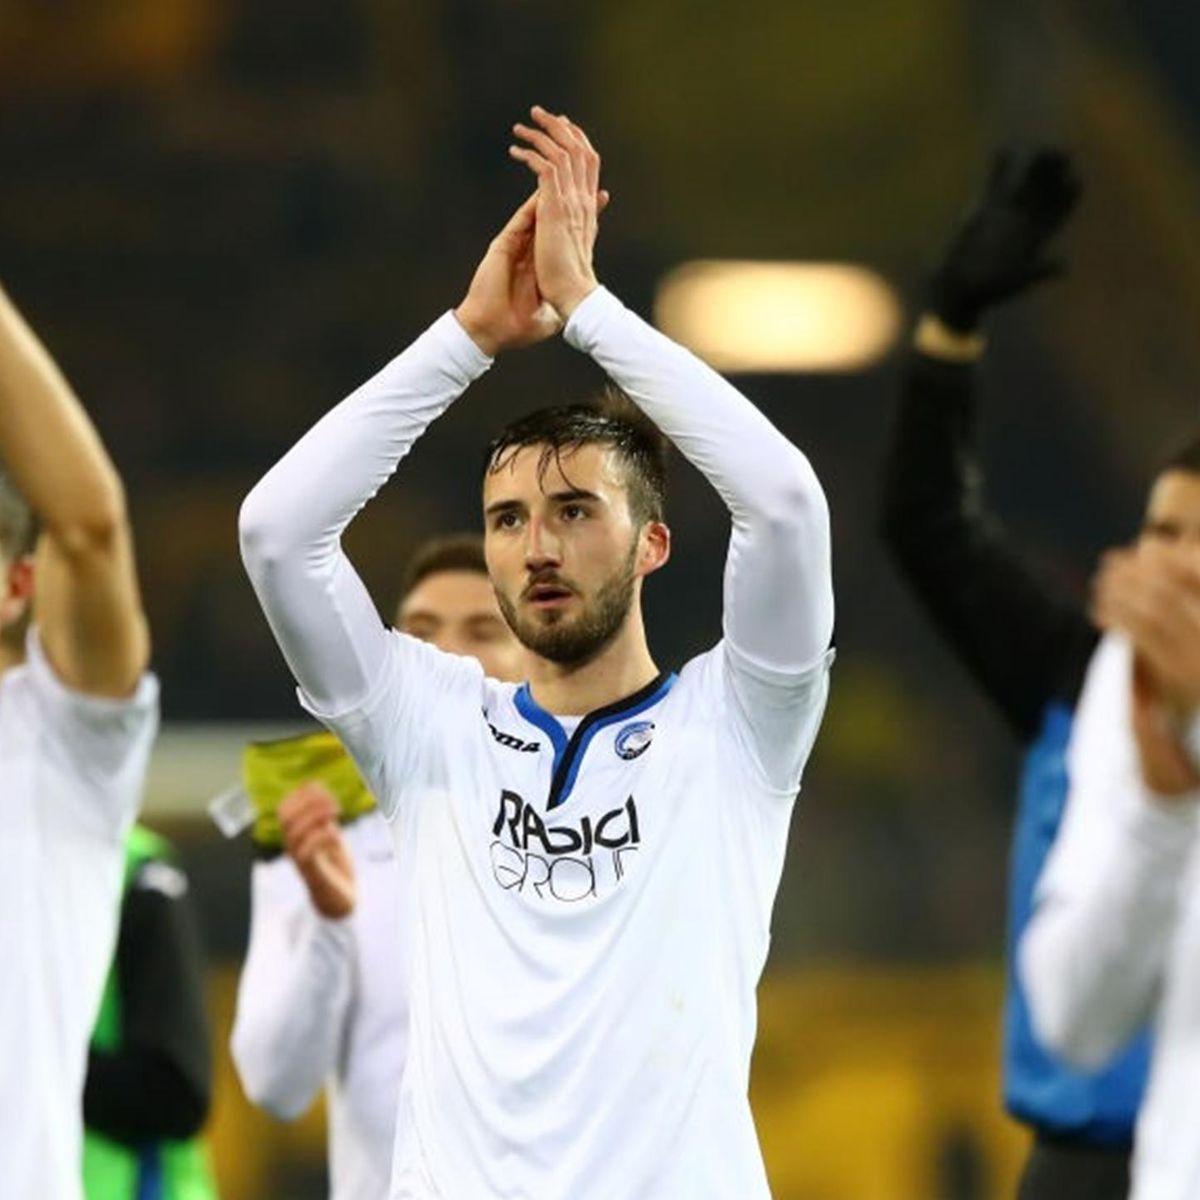 Le pagelle di Borussia Dortmund-Atalanta 3-2 - Eurosport